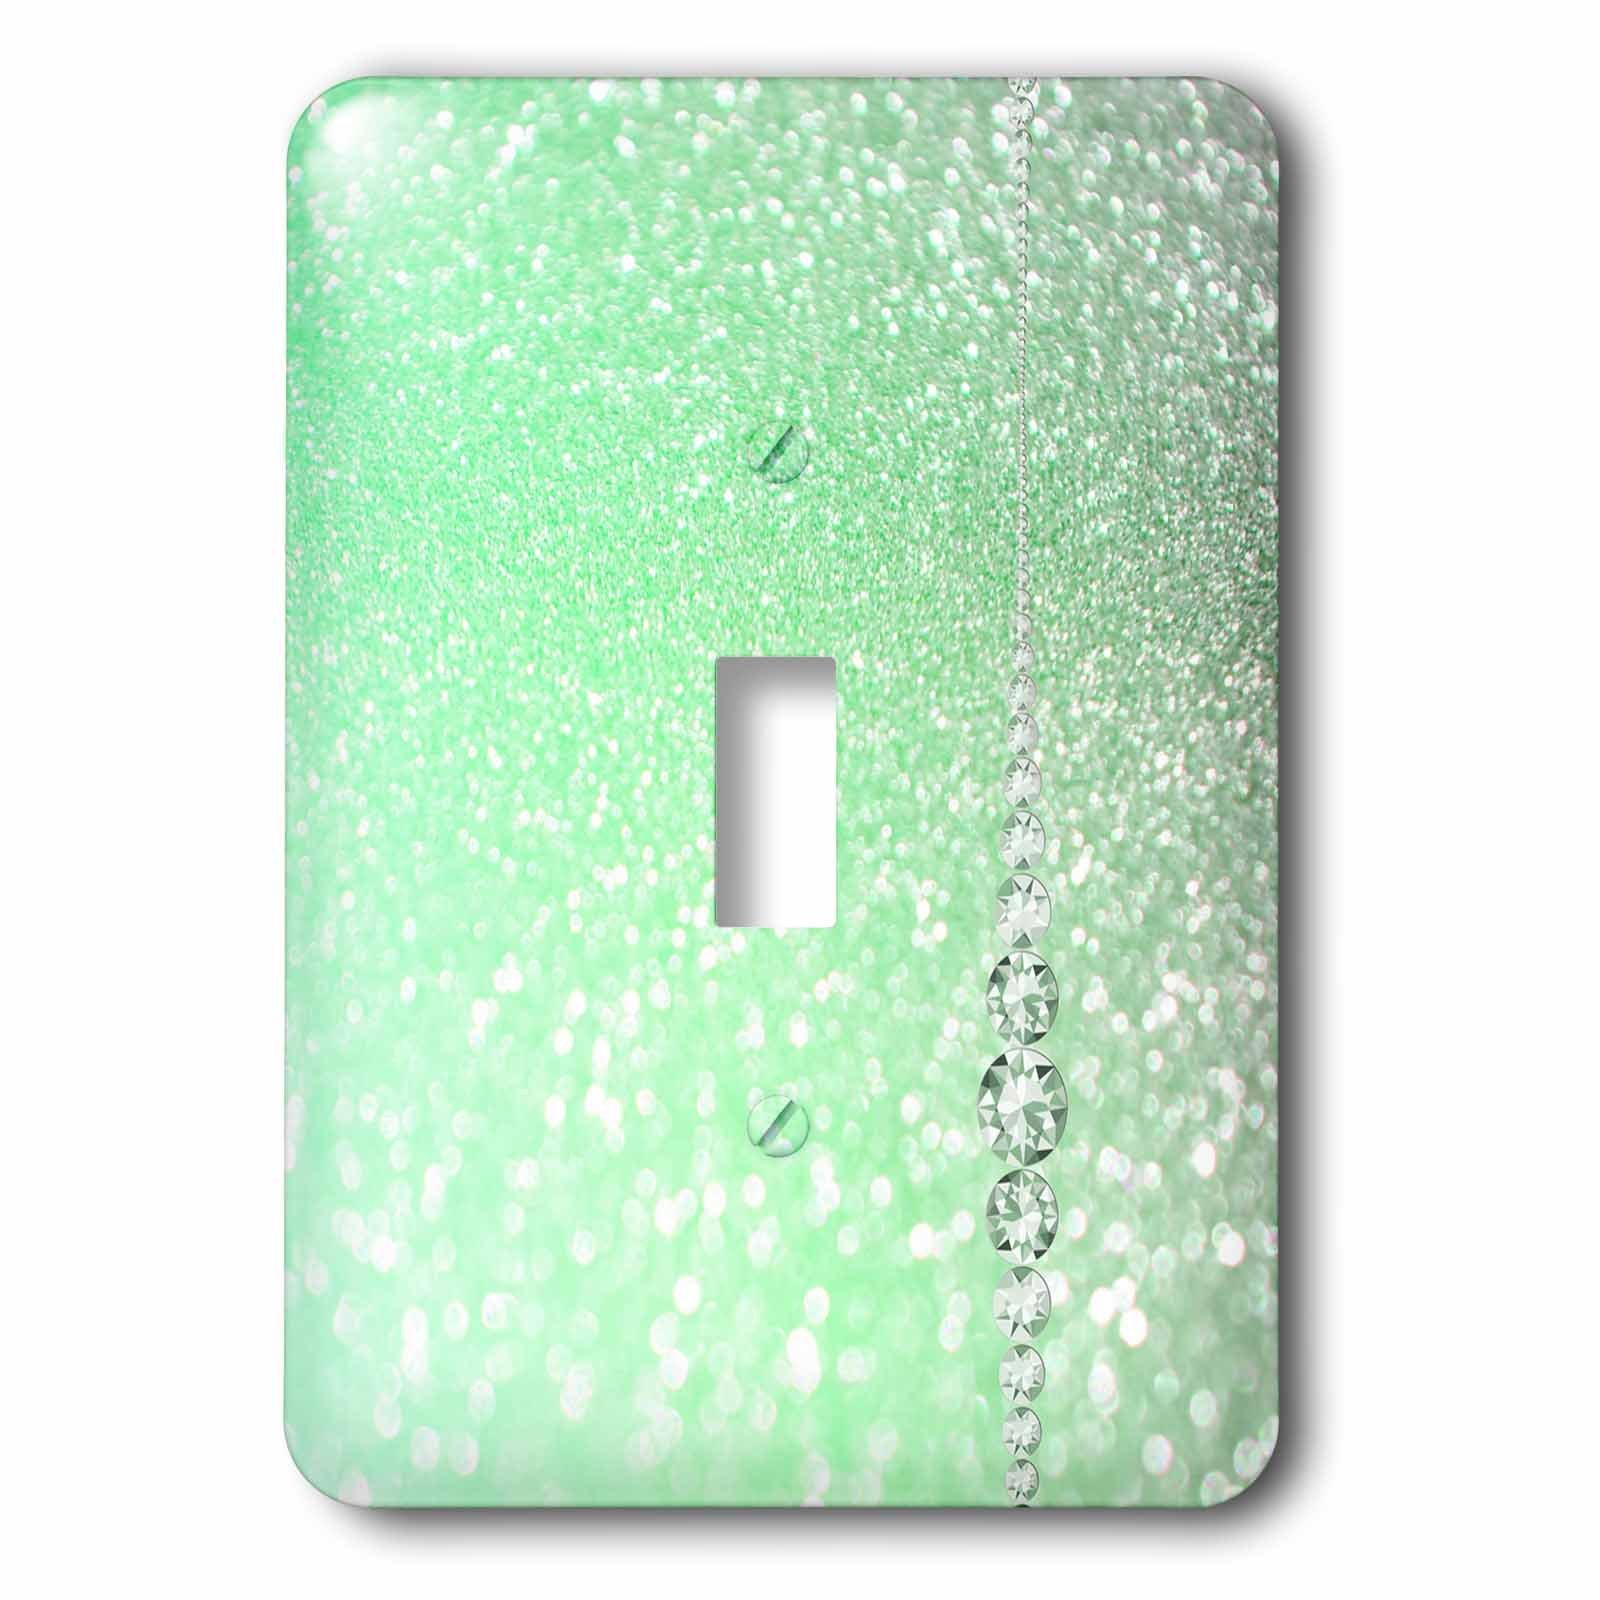 3dRose (lsp_266951_1) Single Toggle Switch (1) Sparkling Mint Green Luxury Elegant Mermaid Glitter Effect Art Print